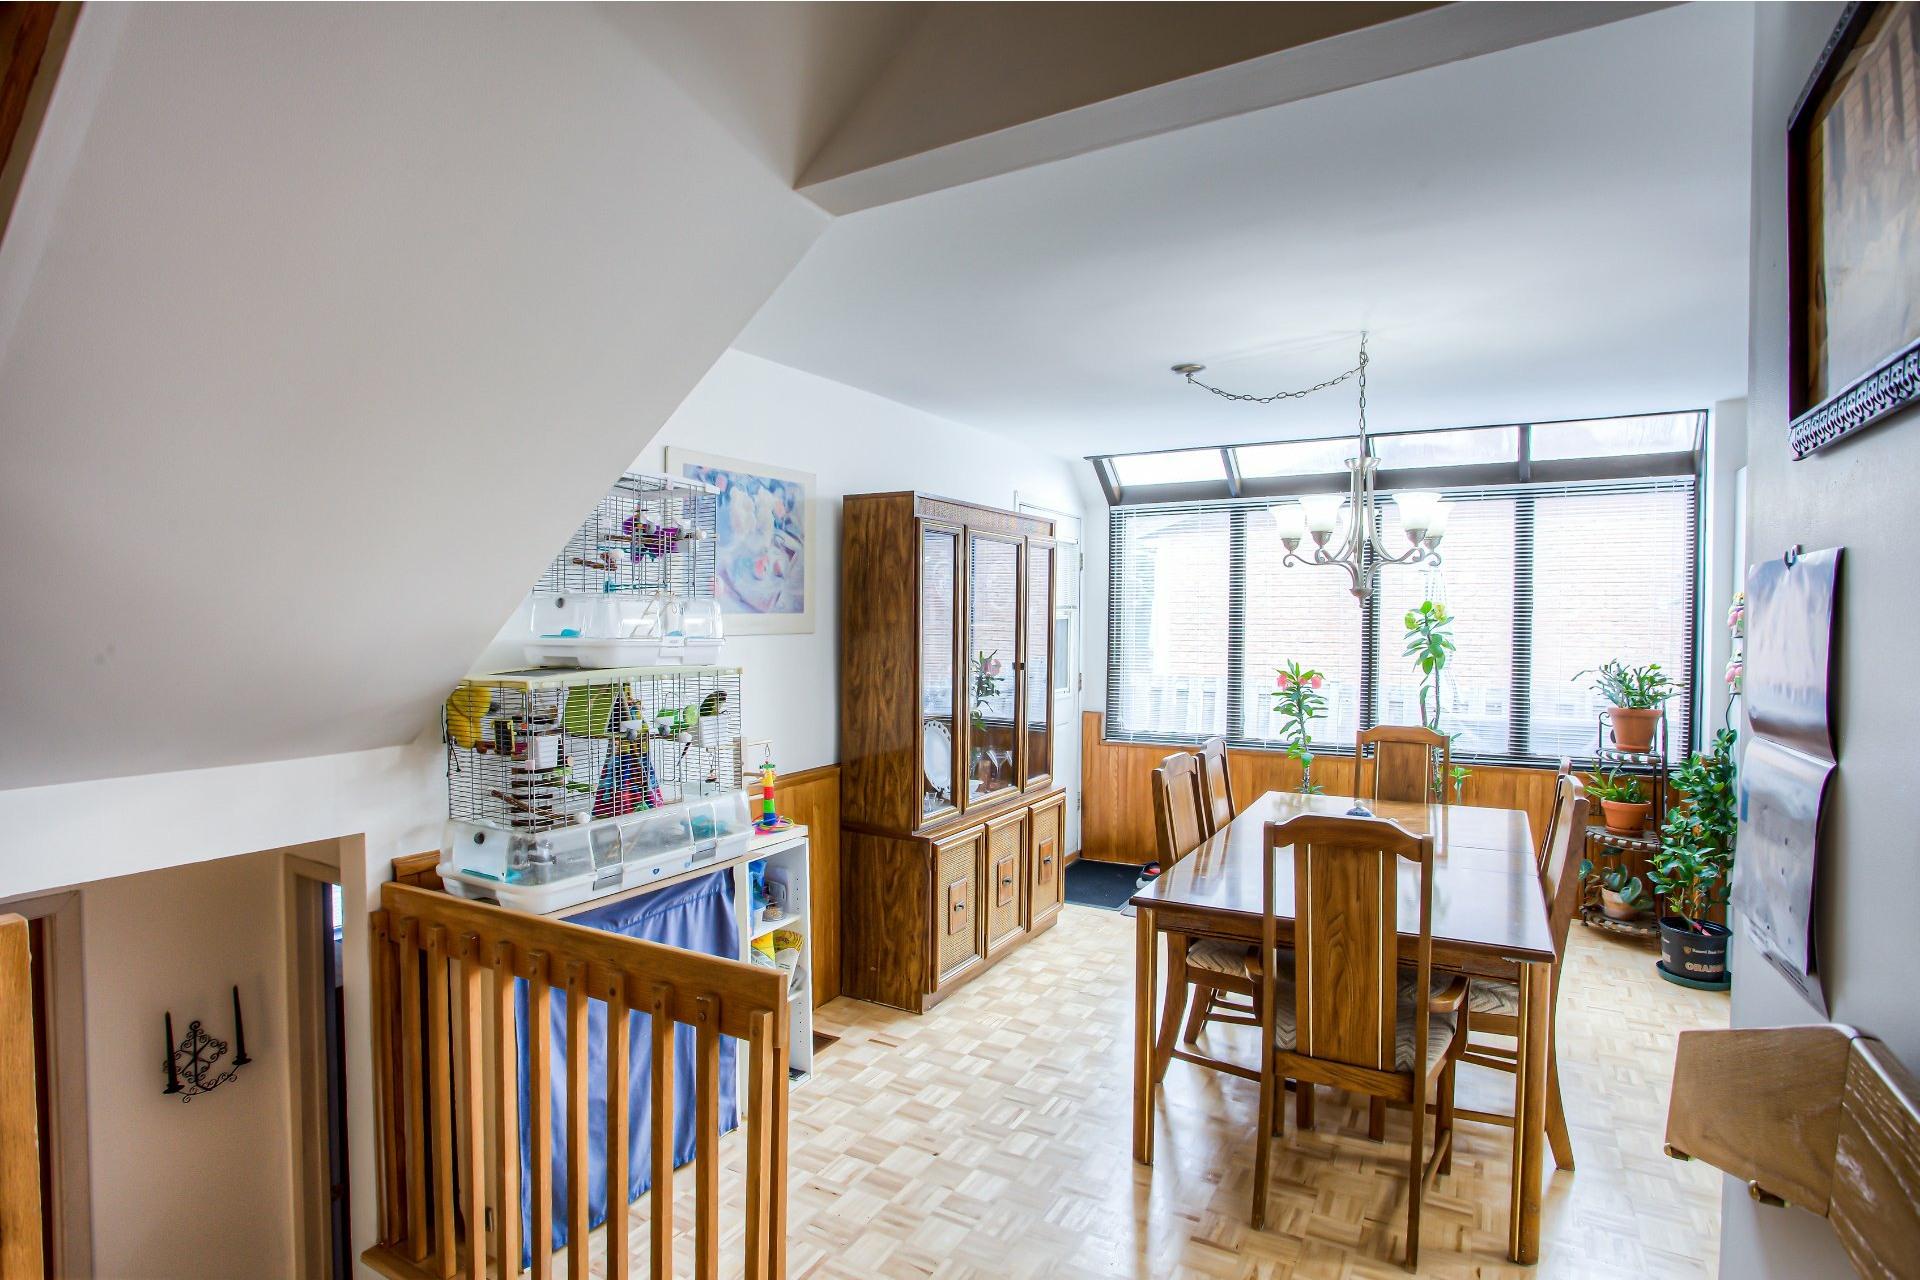 image 5 - MX - Casa sola - MX En venta Dollard-Des Ormeaux - 11 habitaciones